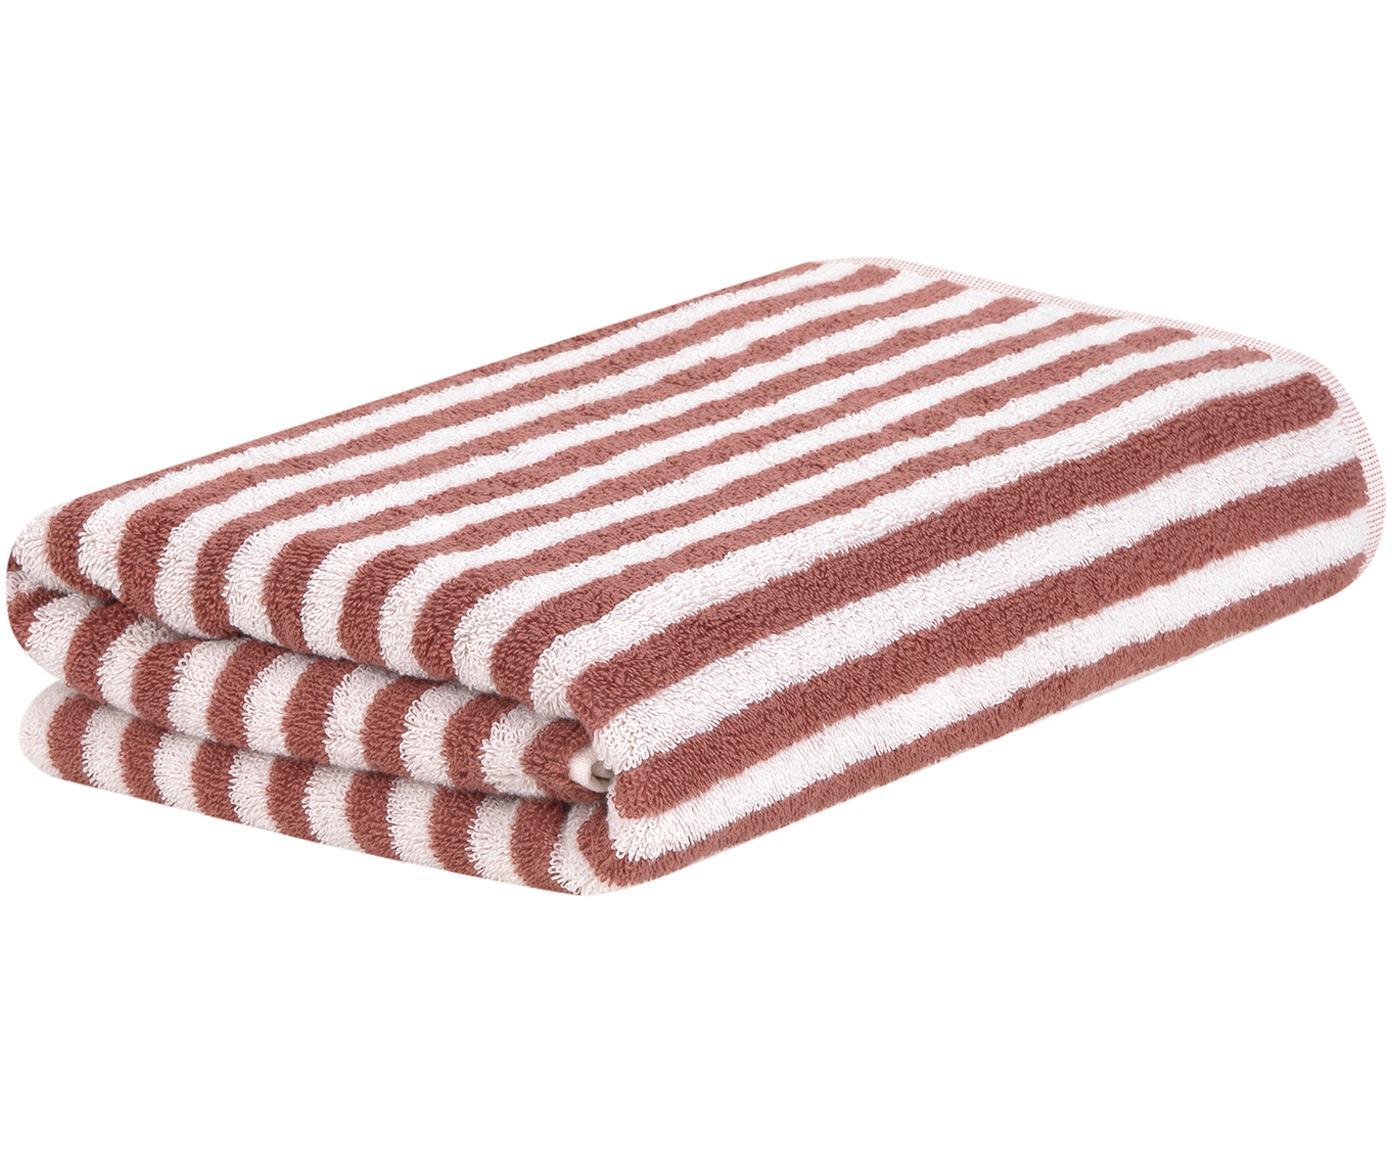 Asciugamano a righe Viola, Terracotta, bianco crema, Asciugamano